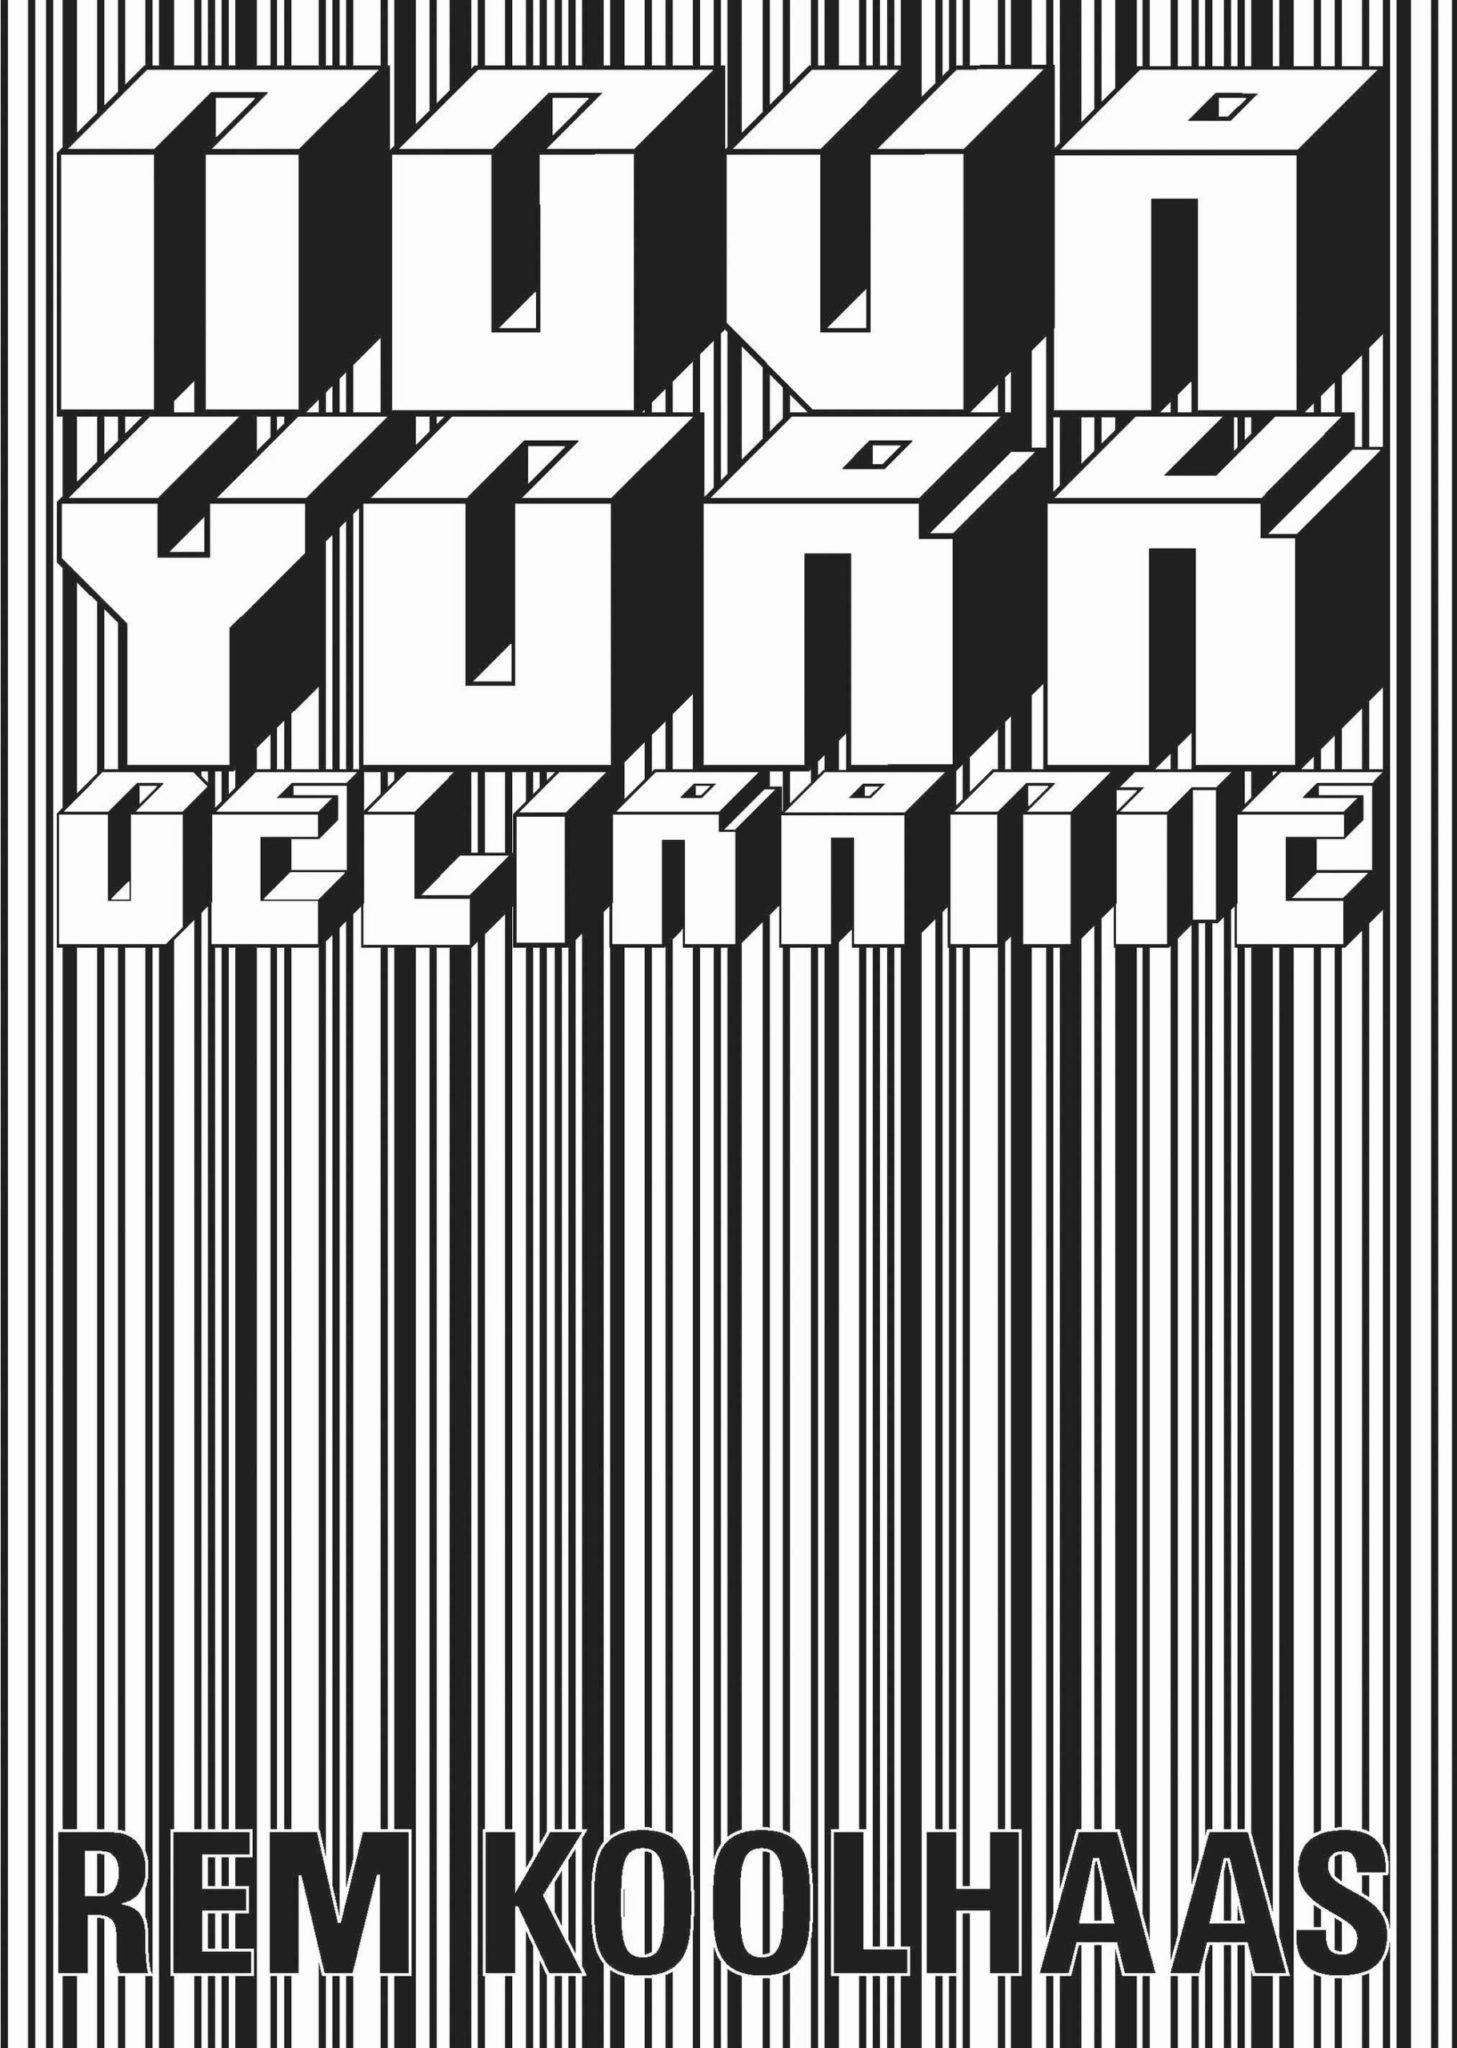 Capa do livro Nova York Delirante